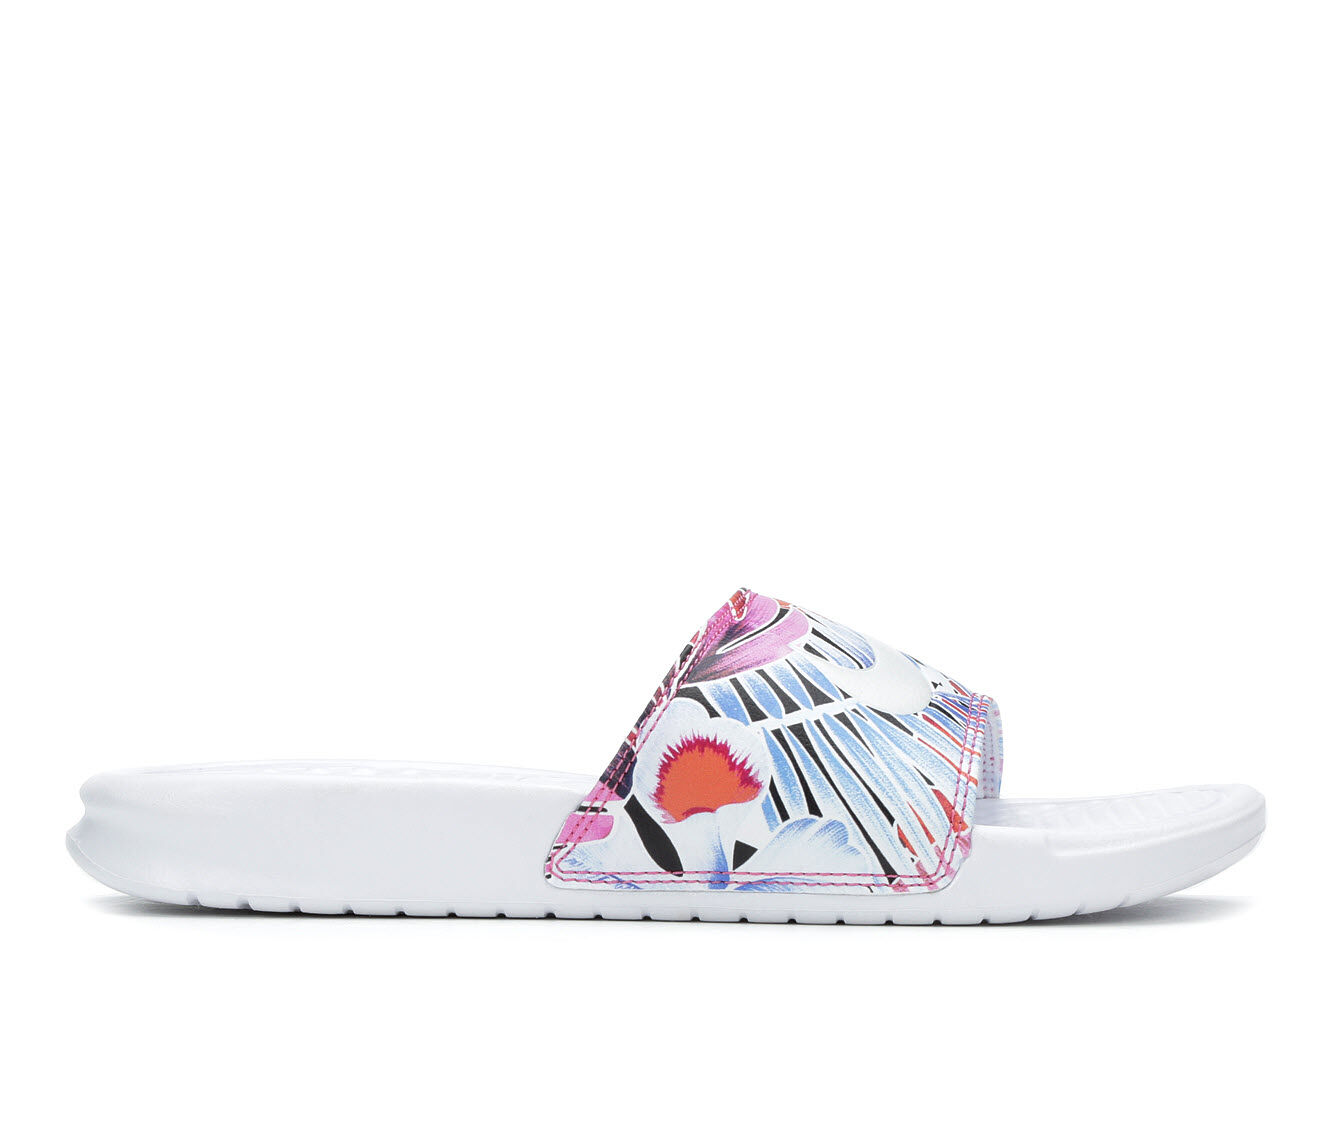 uk shoes_kd6645